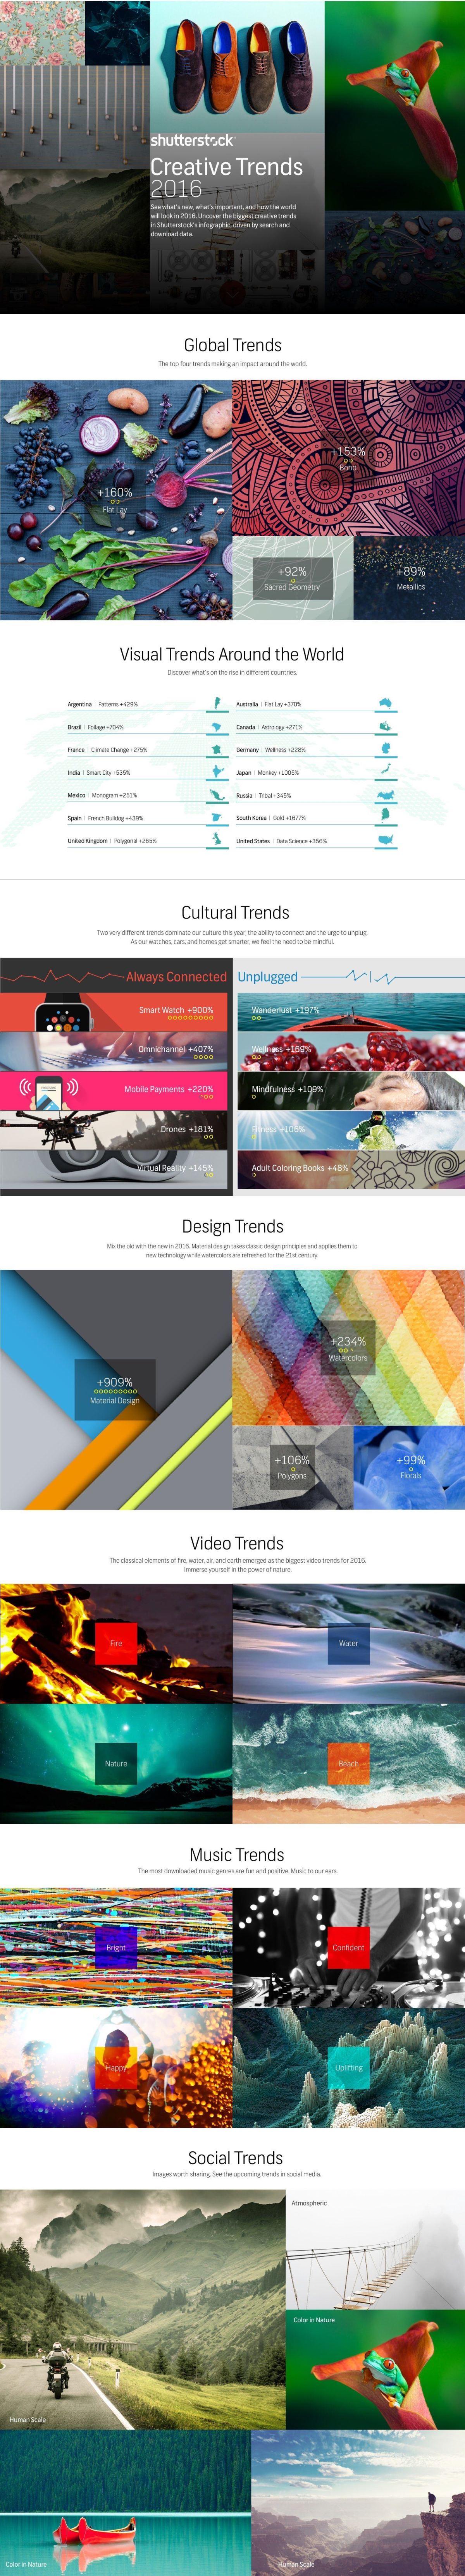 Infographic: Shutterstock's 2016 Creative Trends